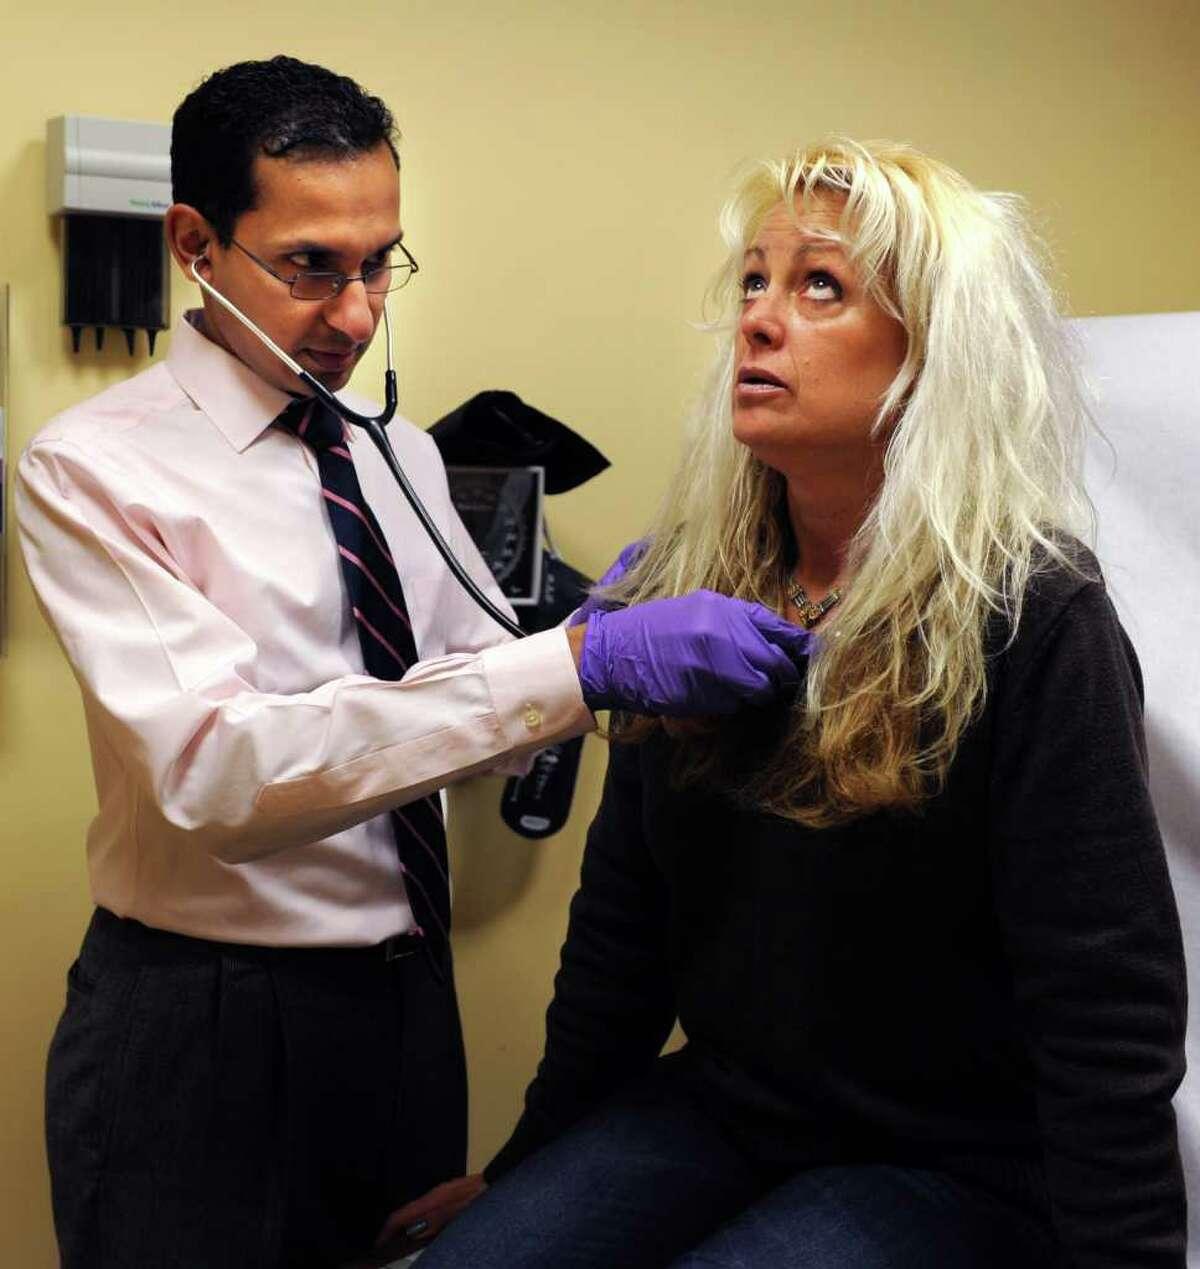 Dr. Sanjeev Rao examines Marcia Barry, of Fairfield, Thursday, Jan. 12, 2012 at the Fairfield Urgent Care Clinic on Stillson Road in Fairfield, Conn.